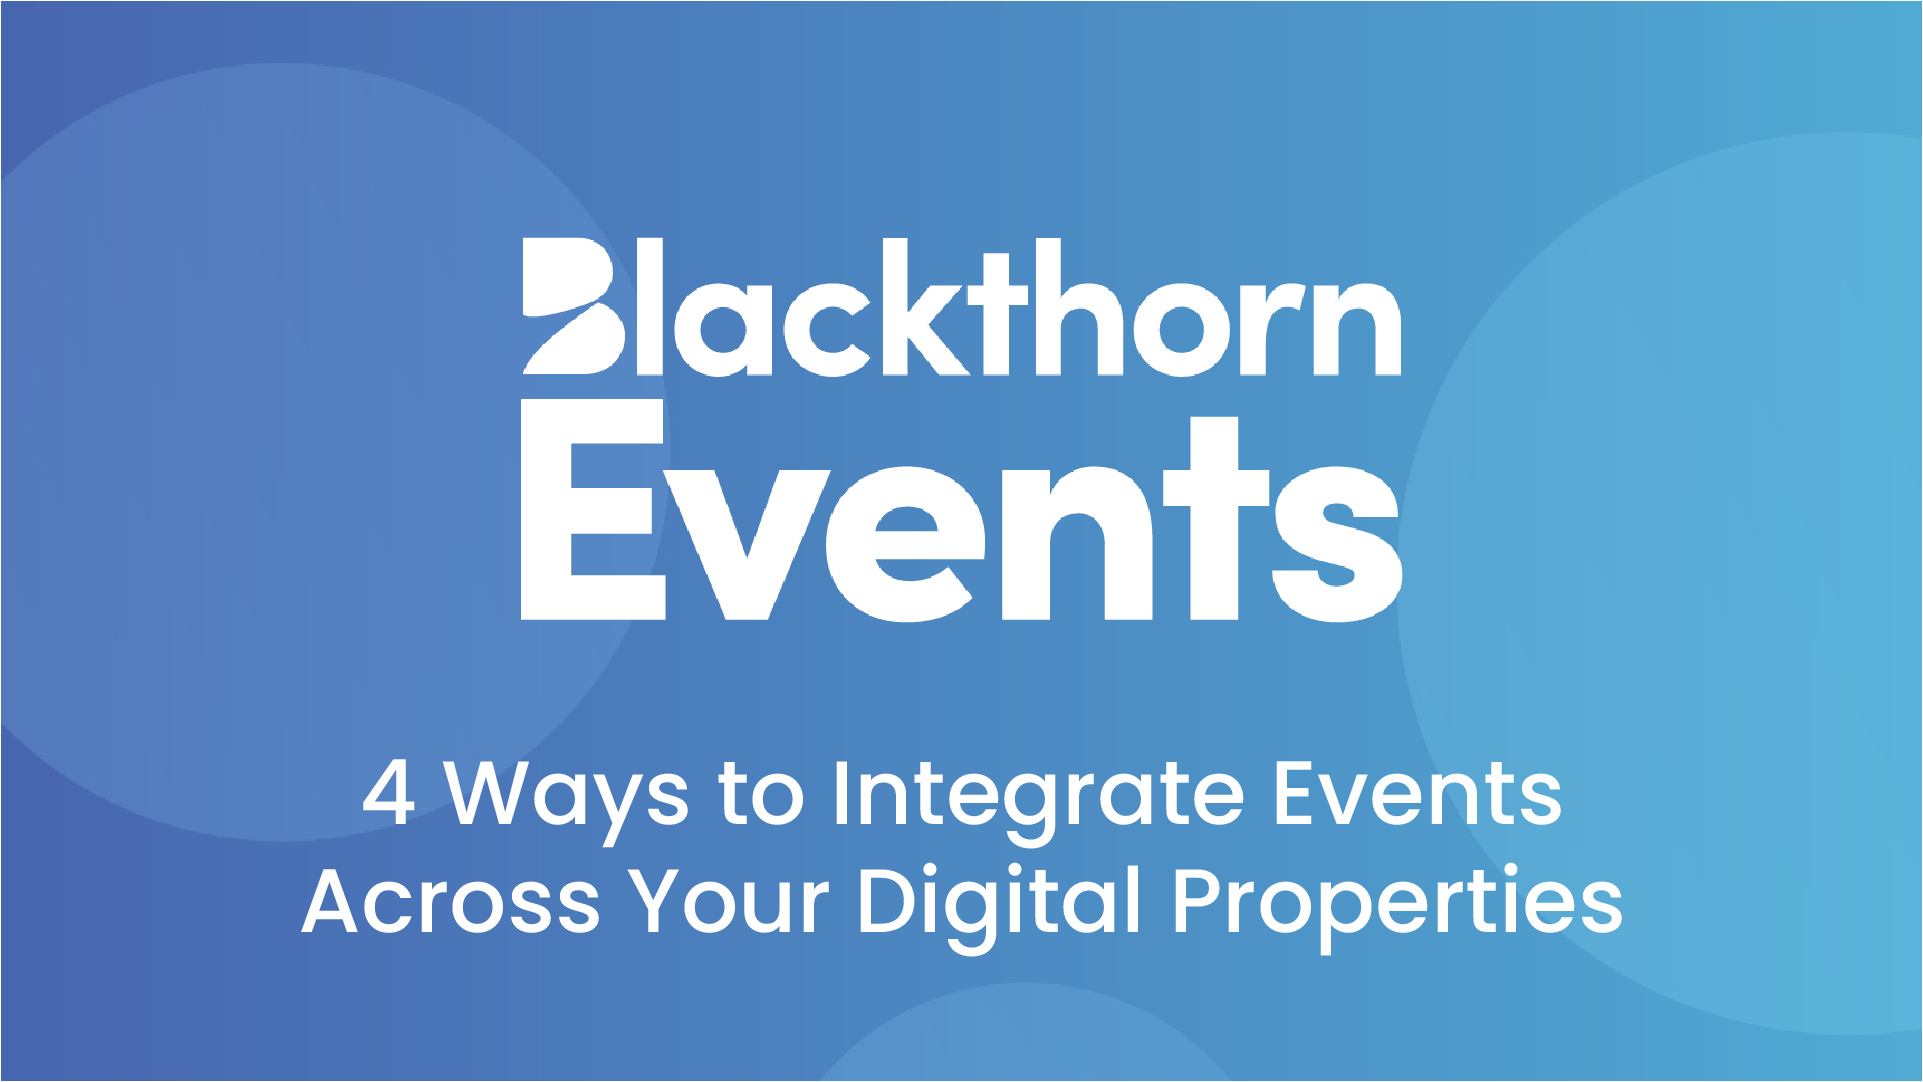 Integrating events across your digital properties